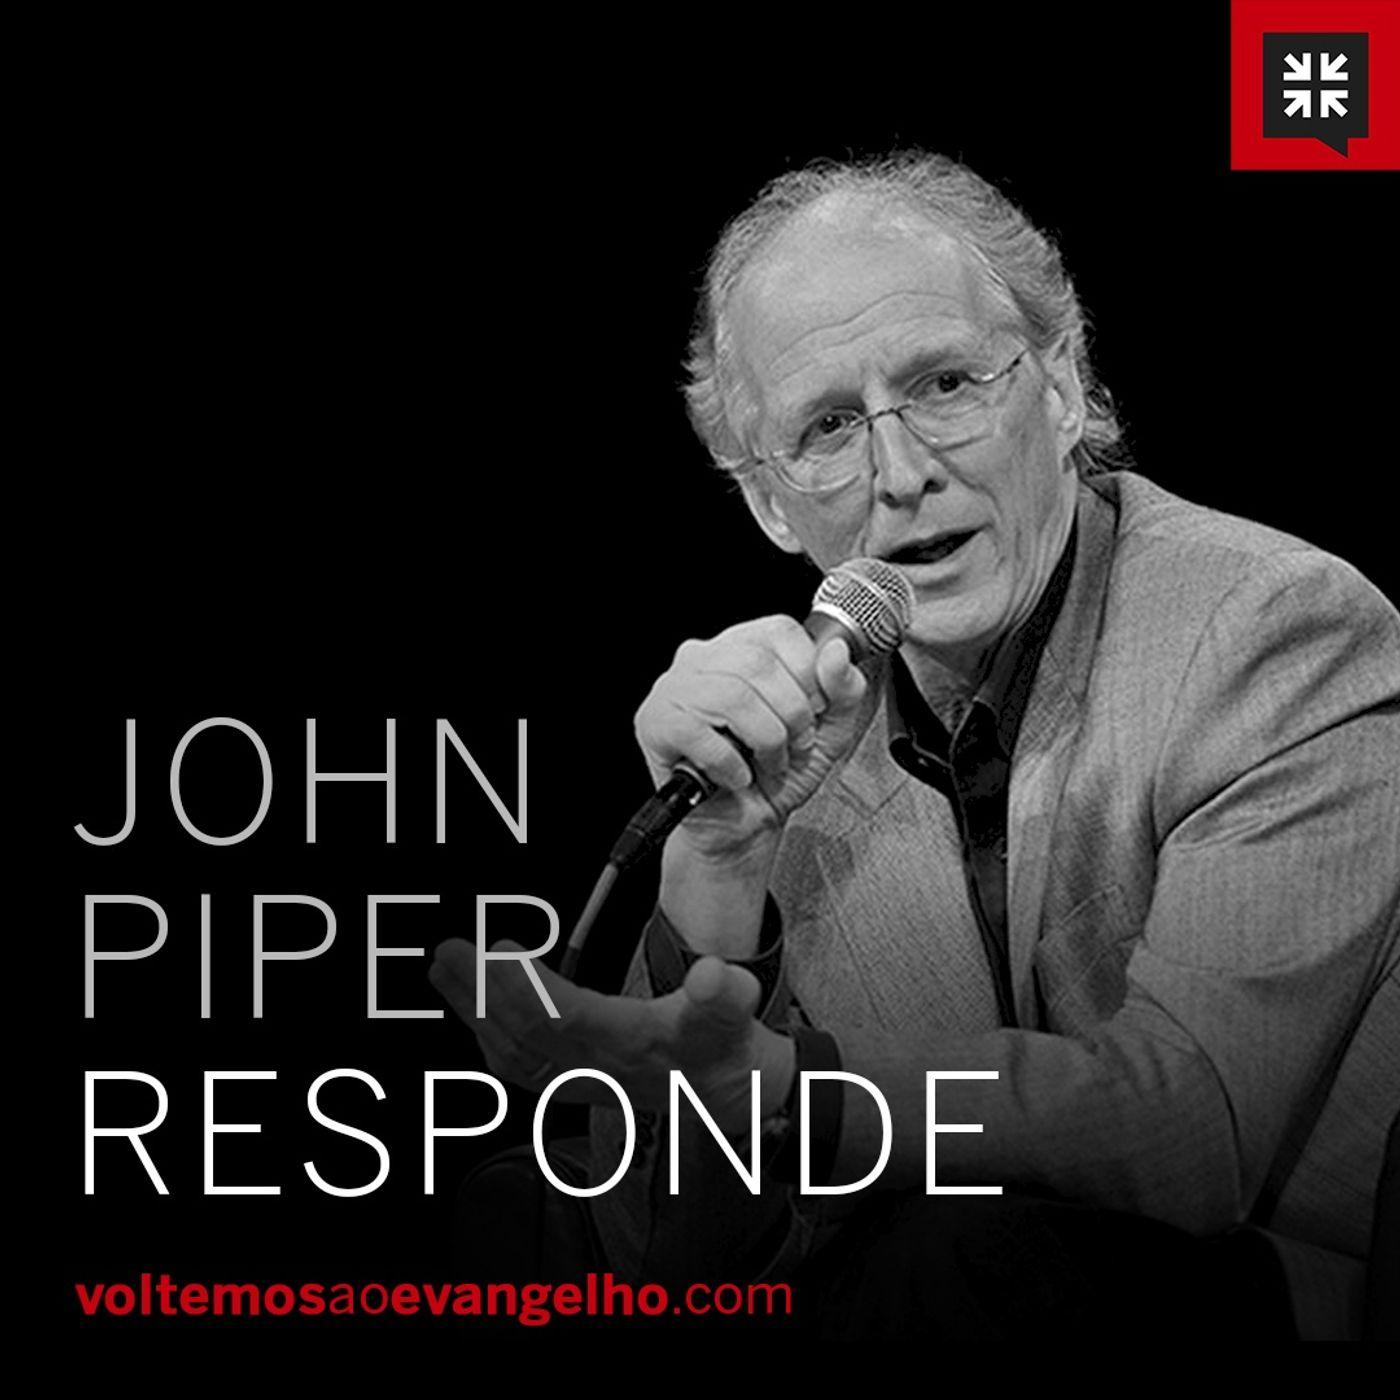 Como John Piper lidou com o pecado de Ravi Zacharias? // John Piper Responde